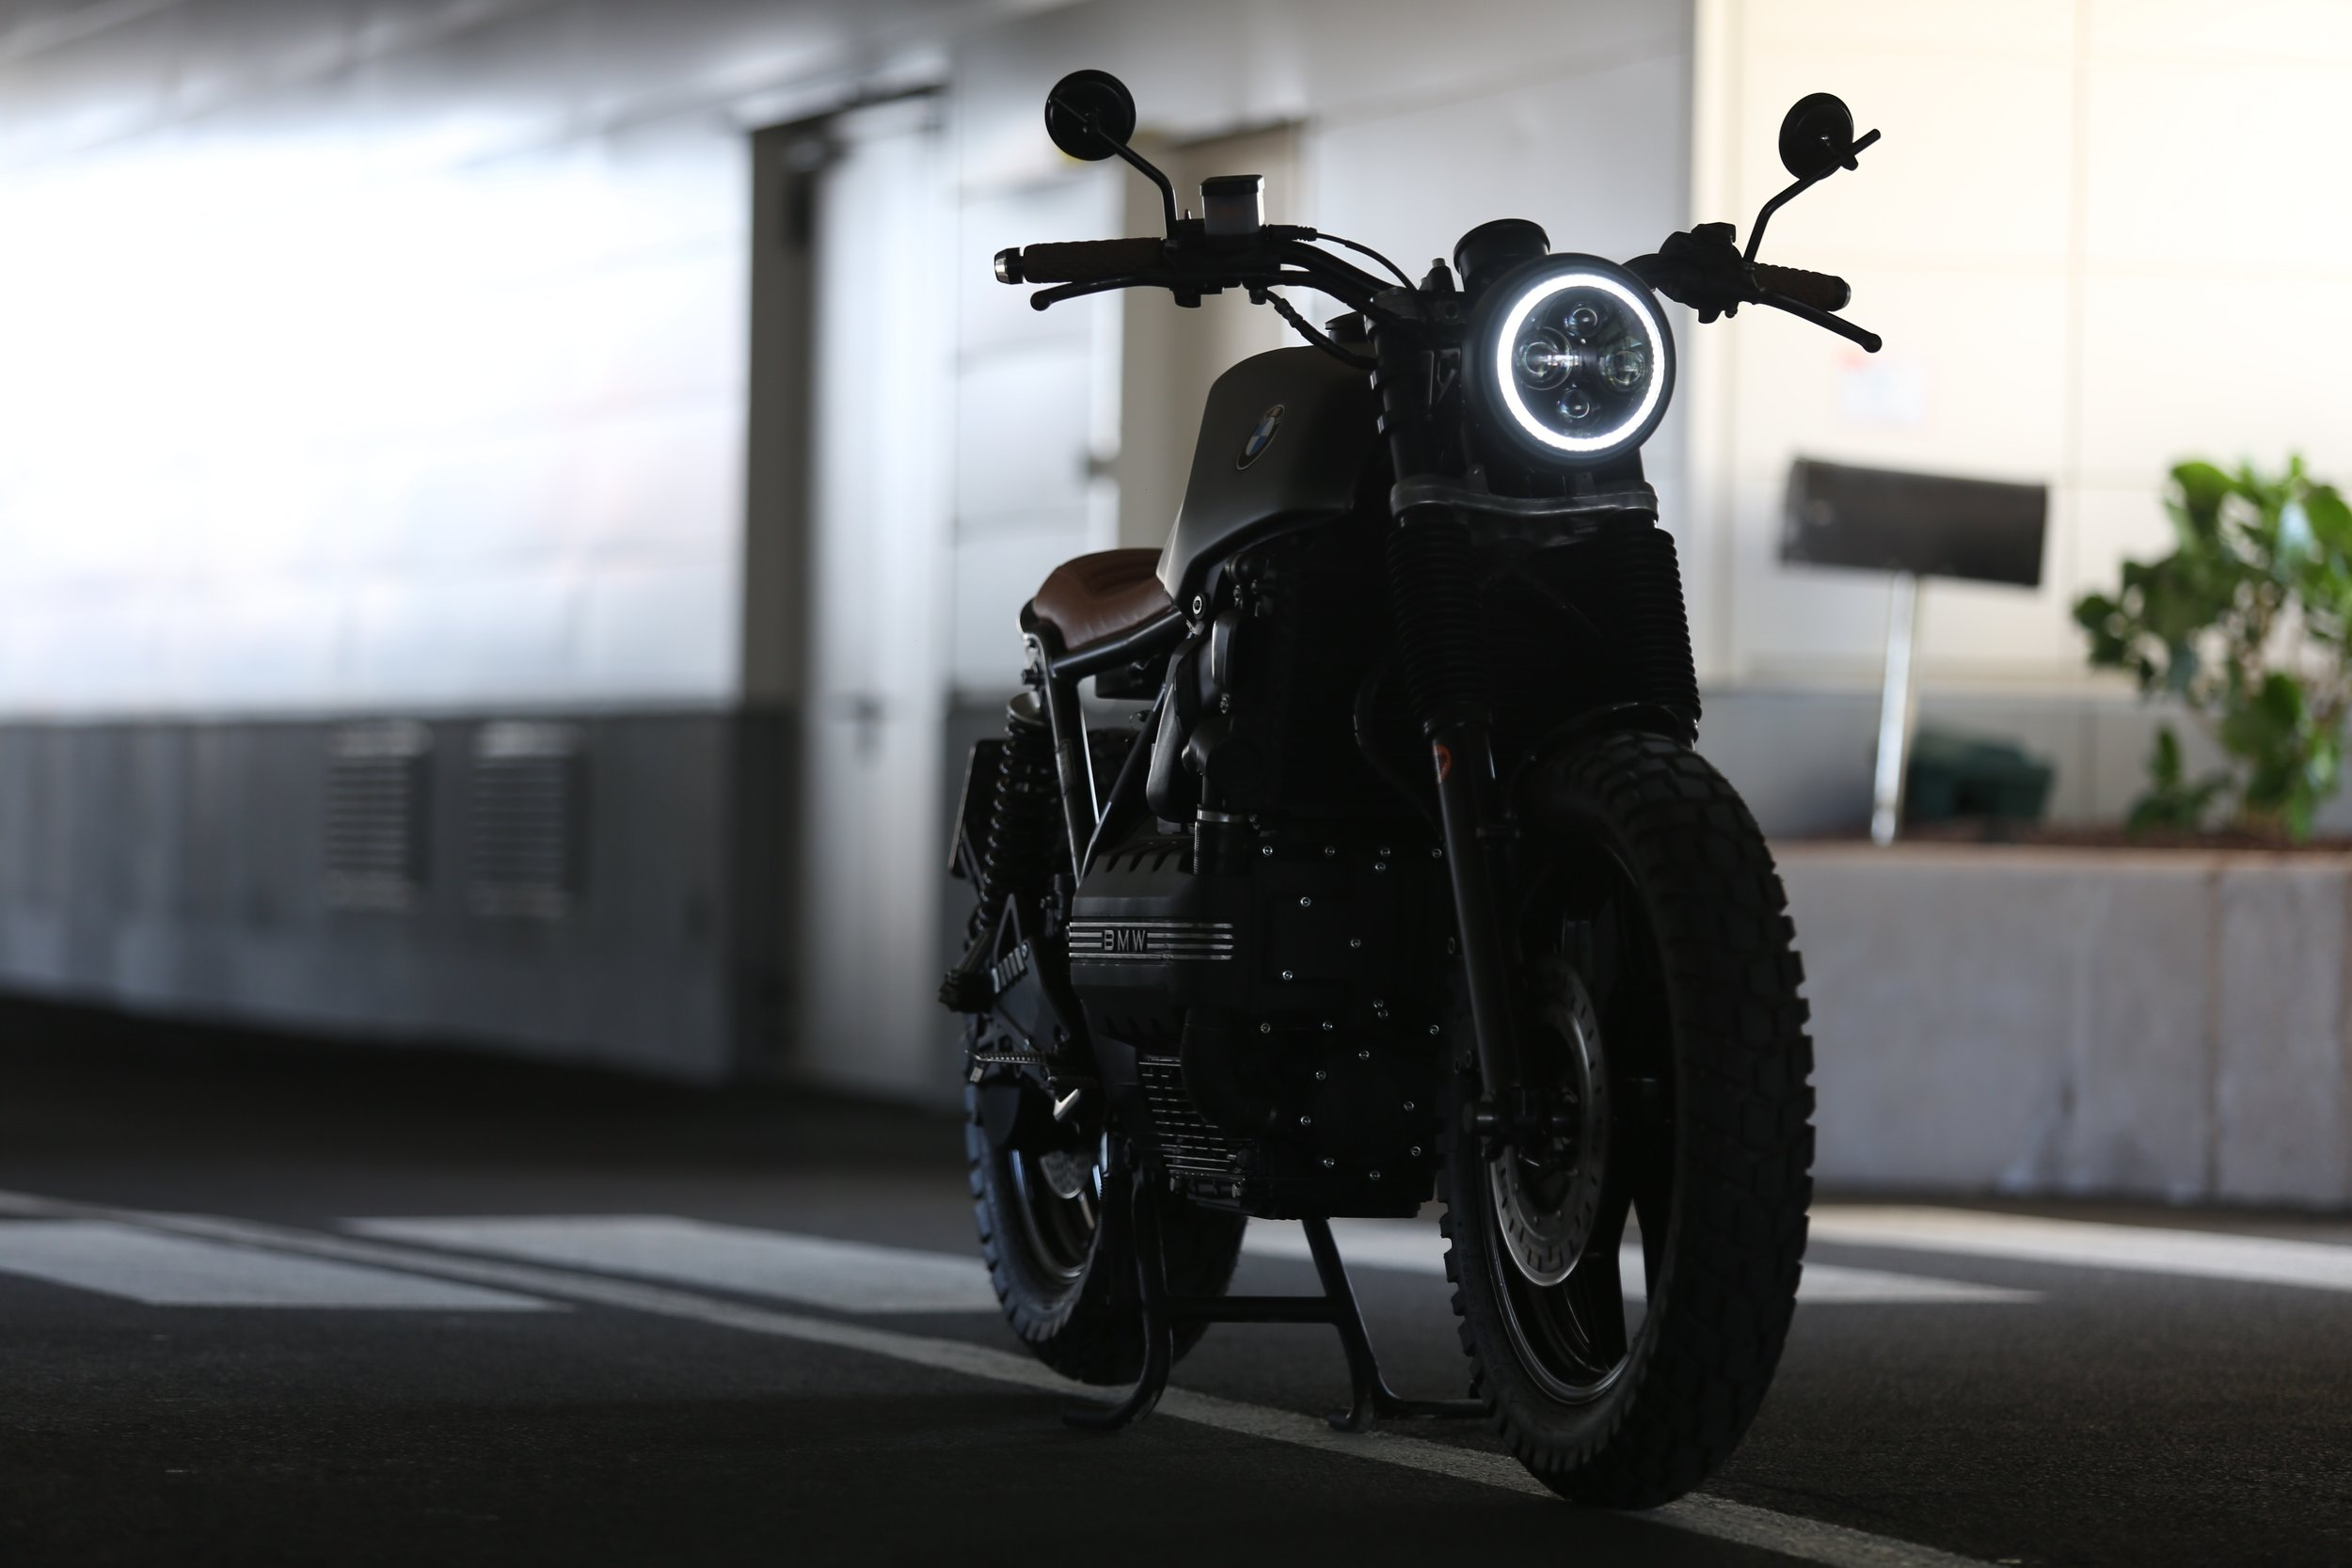 4k-wallpaper-automotive-bike-1413412.jpg